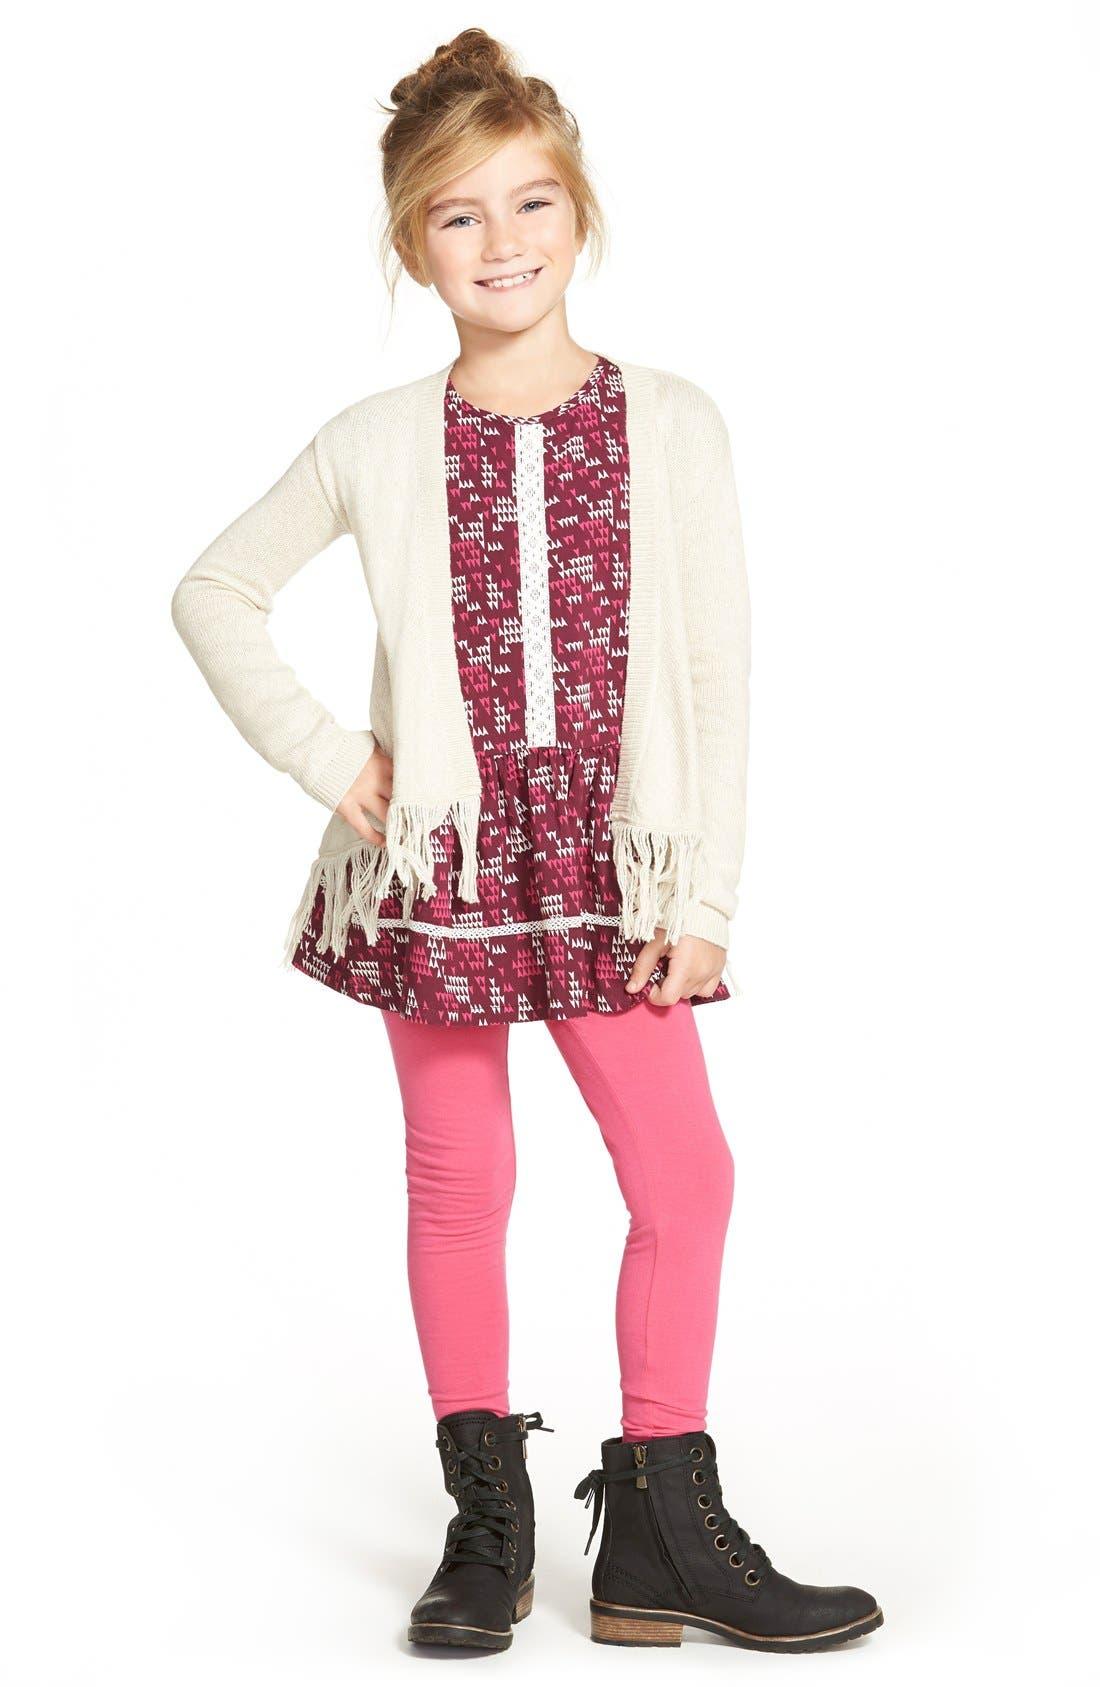 Alternate Image 1 Selected - Tucker + Tate Crochet Trim WovenTunic Top (Toddler Girls, Little Girls & Big Girls)